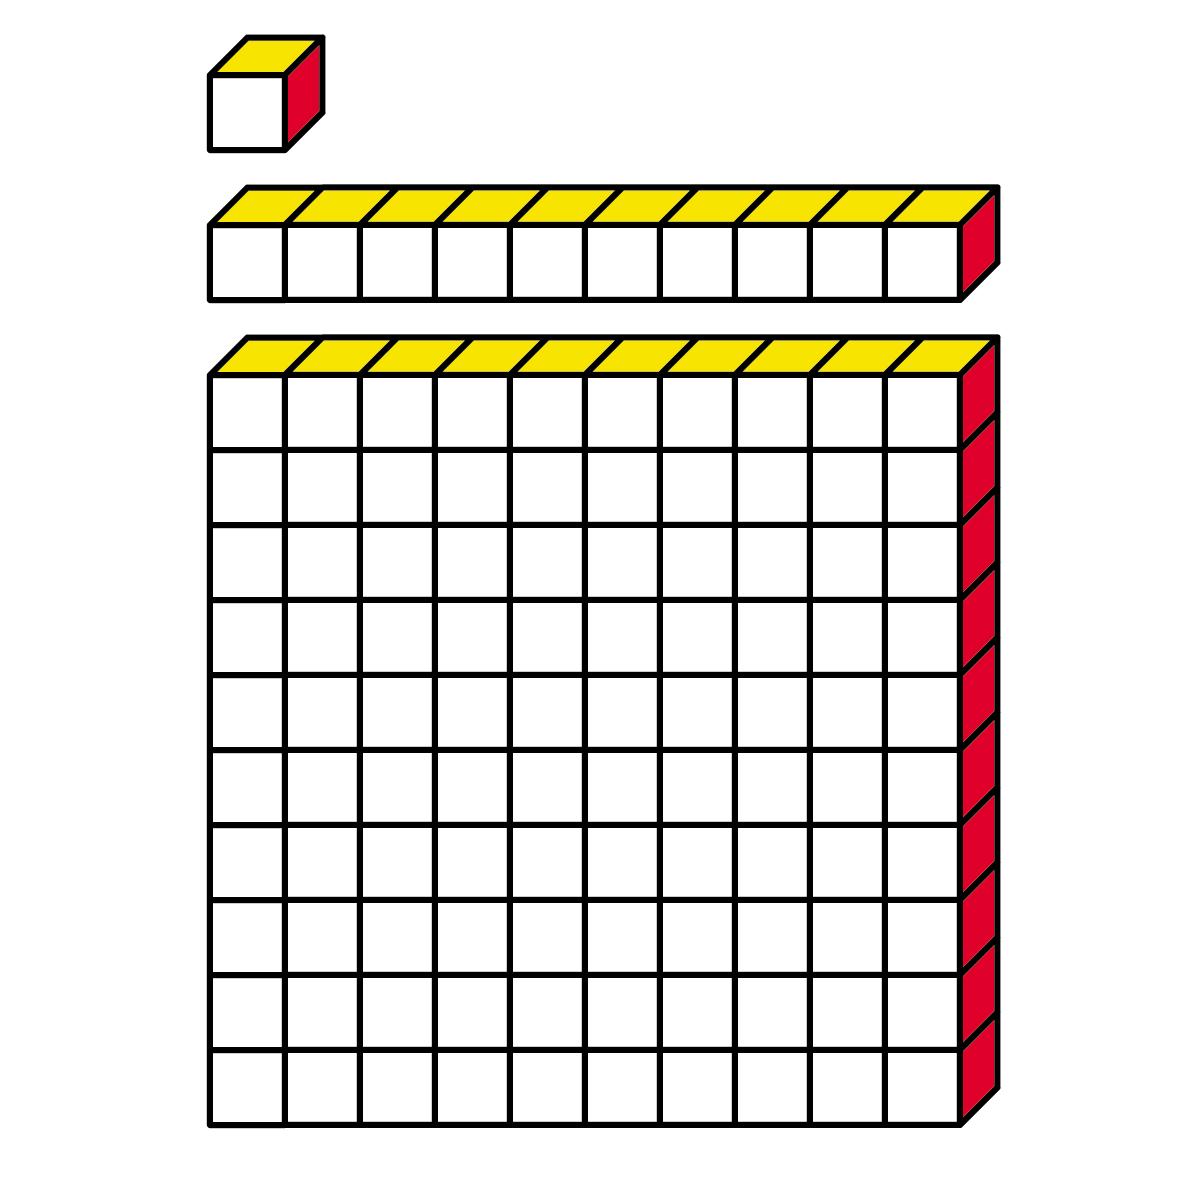 Workbooks mab worksheets : Base Ten Blocks Clipart | Free Download Clip Art | Free Clip Art ...